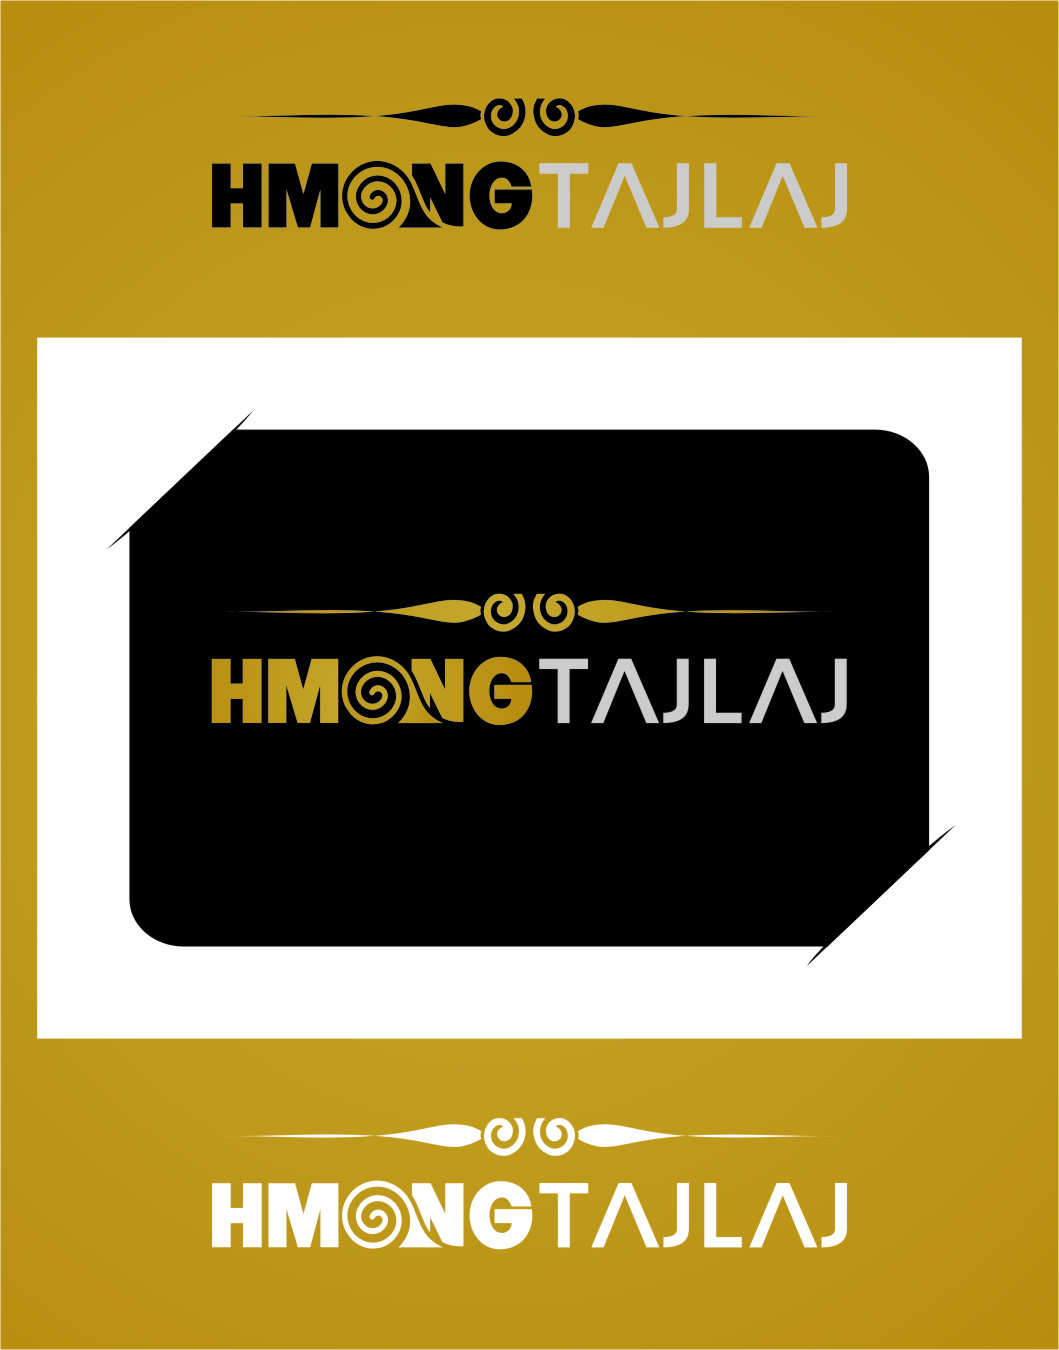 Logo Design by Ngepet_art - Entry No. 9 in the Logo Design Contest Unique Logo Design Wanted for Hmong Tajlaj.